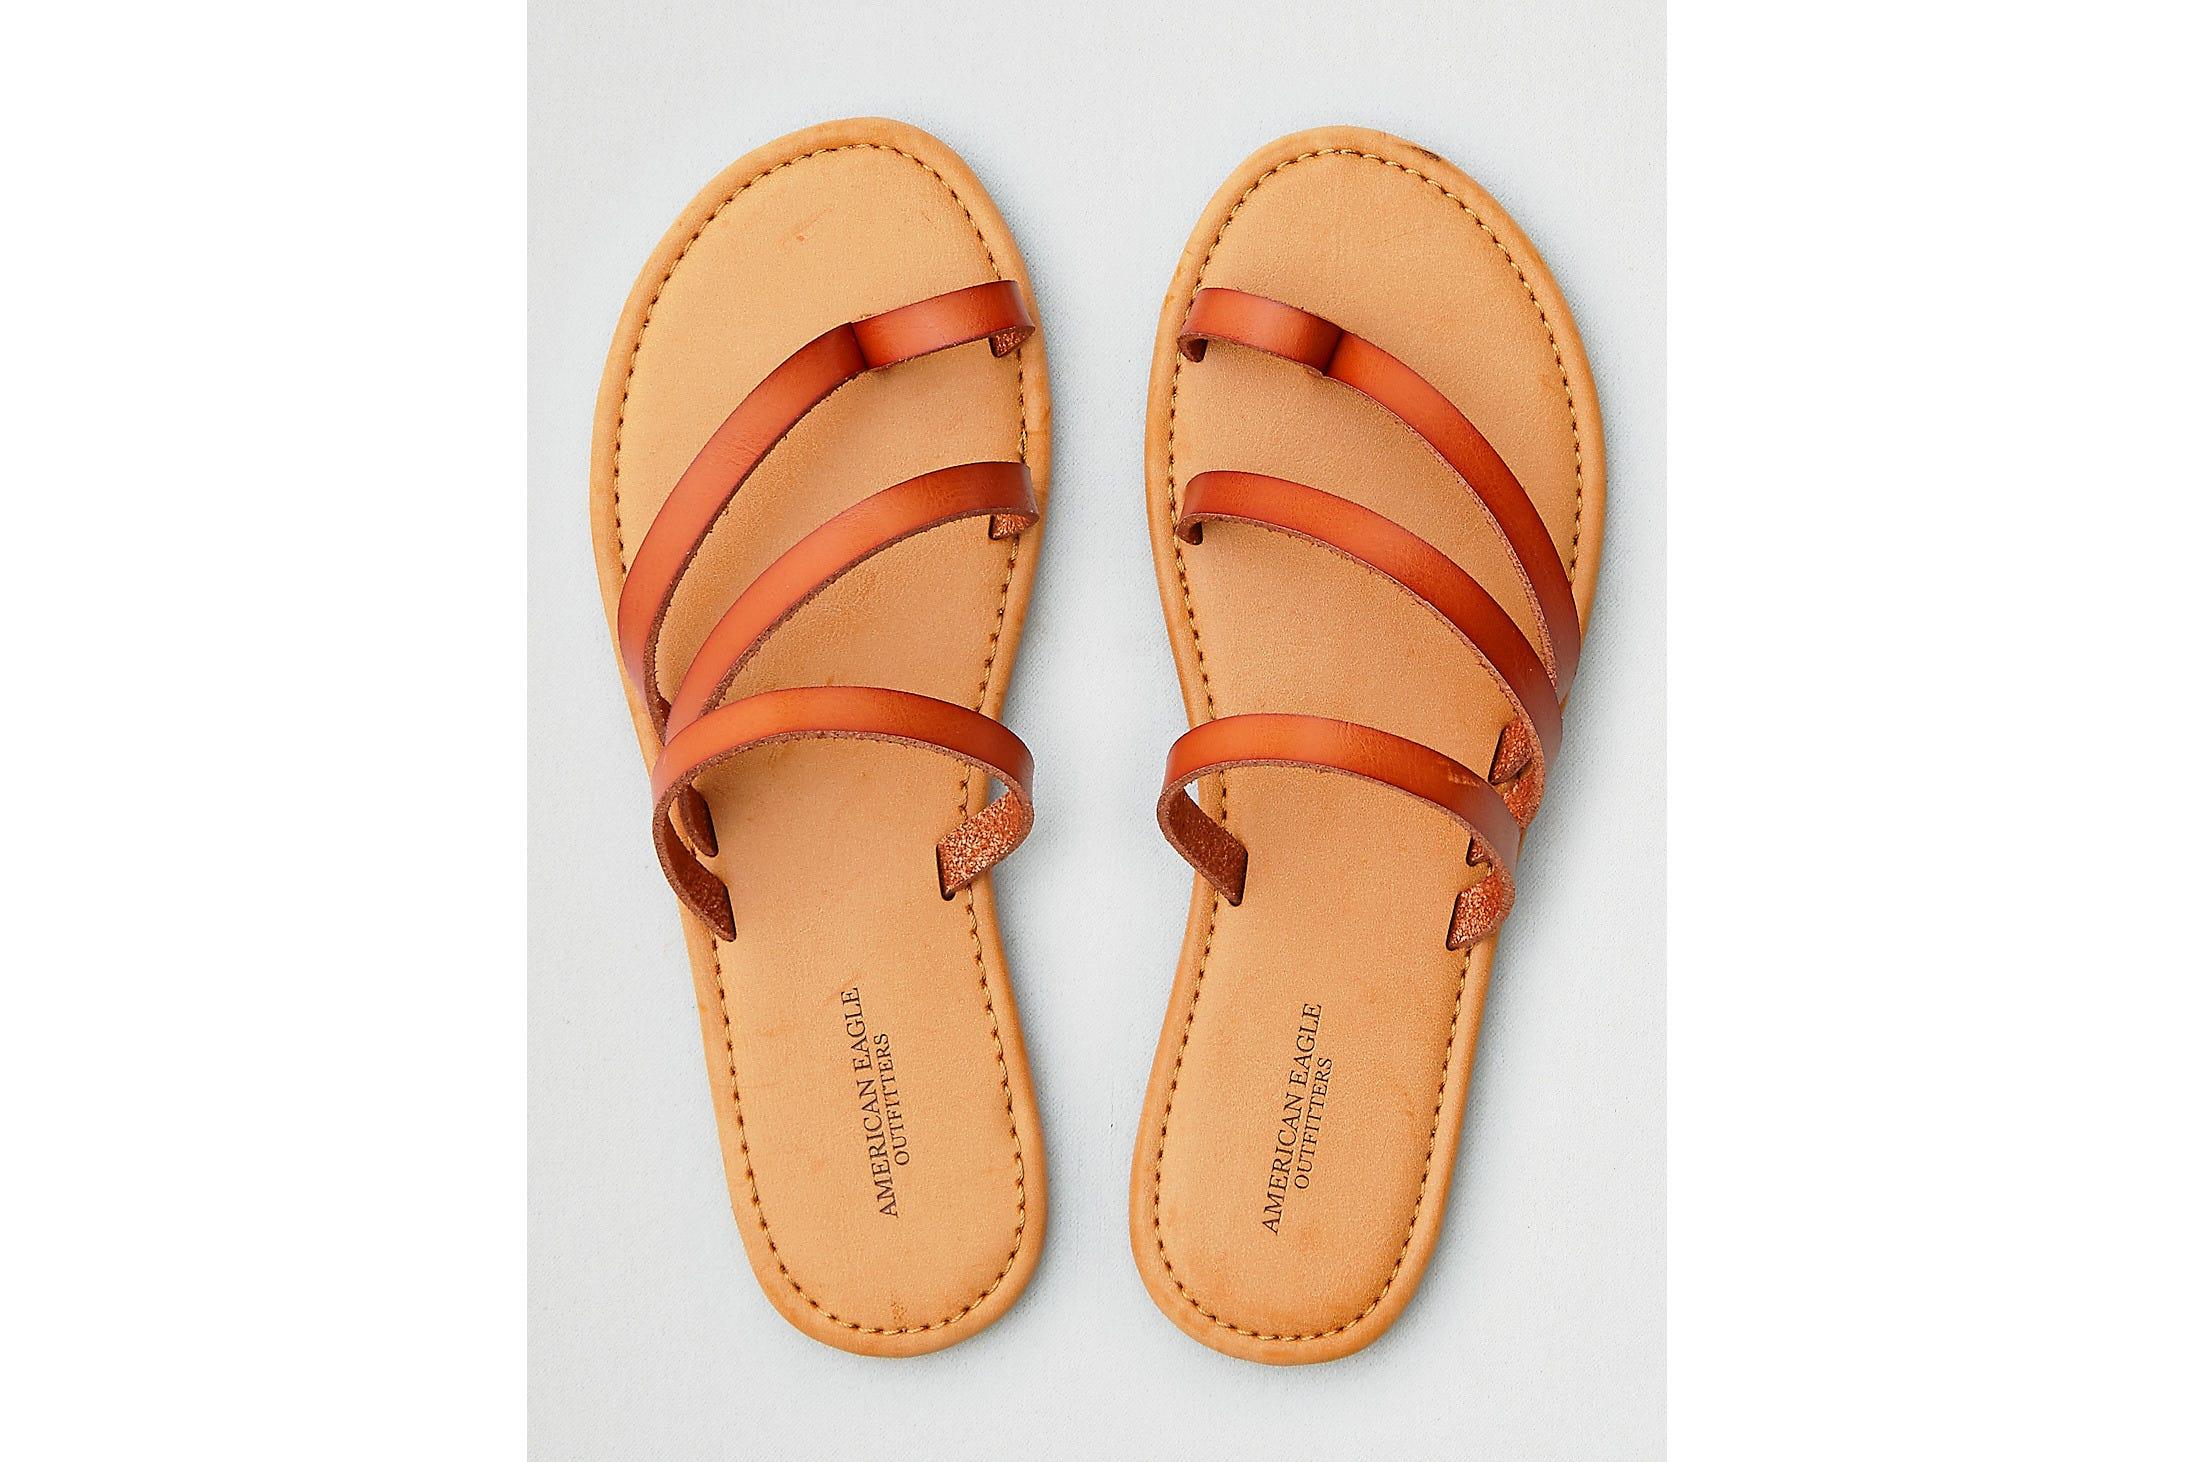 4de29e557229 Cute Toe Ring Sandals - Spring Summer 2018 Shoe Trend